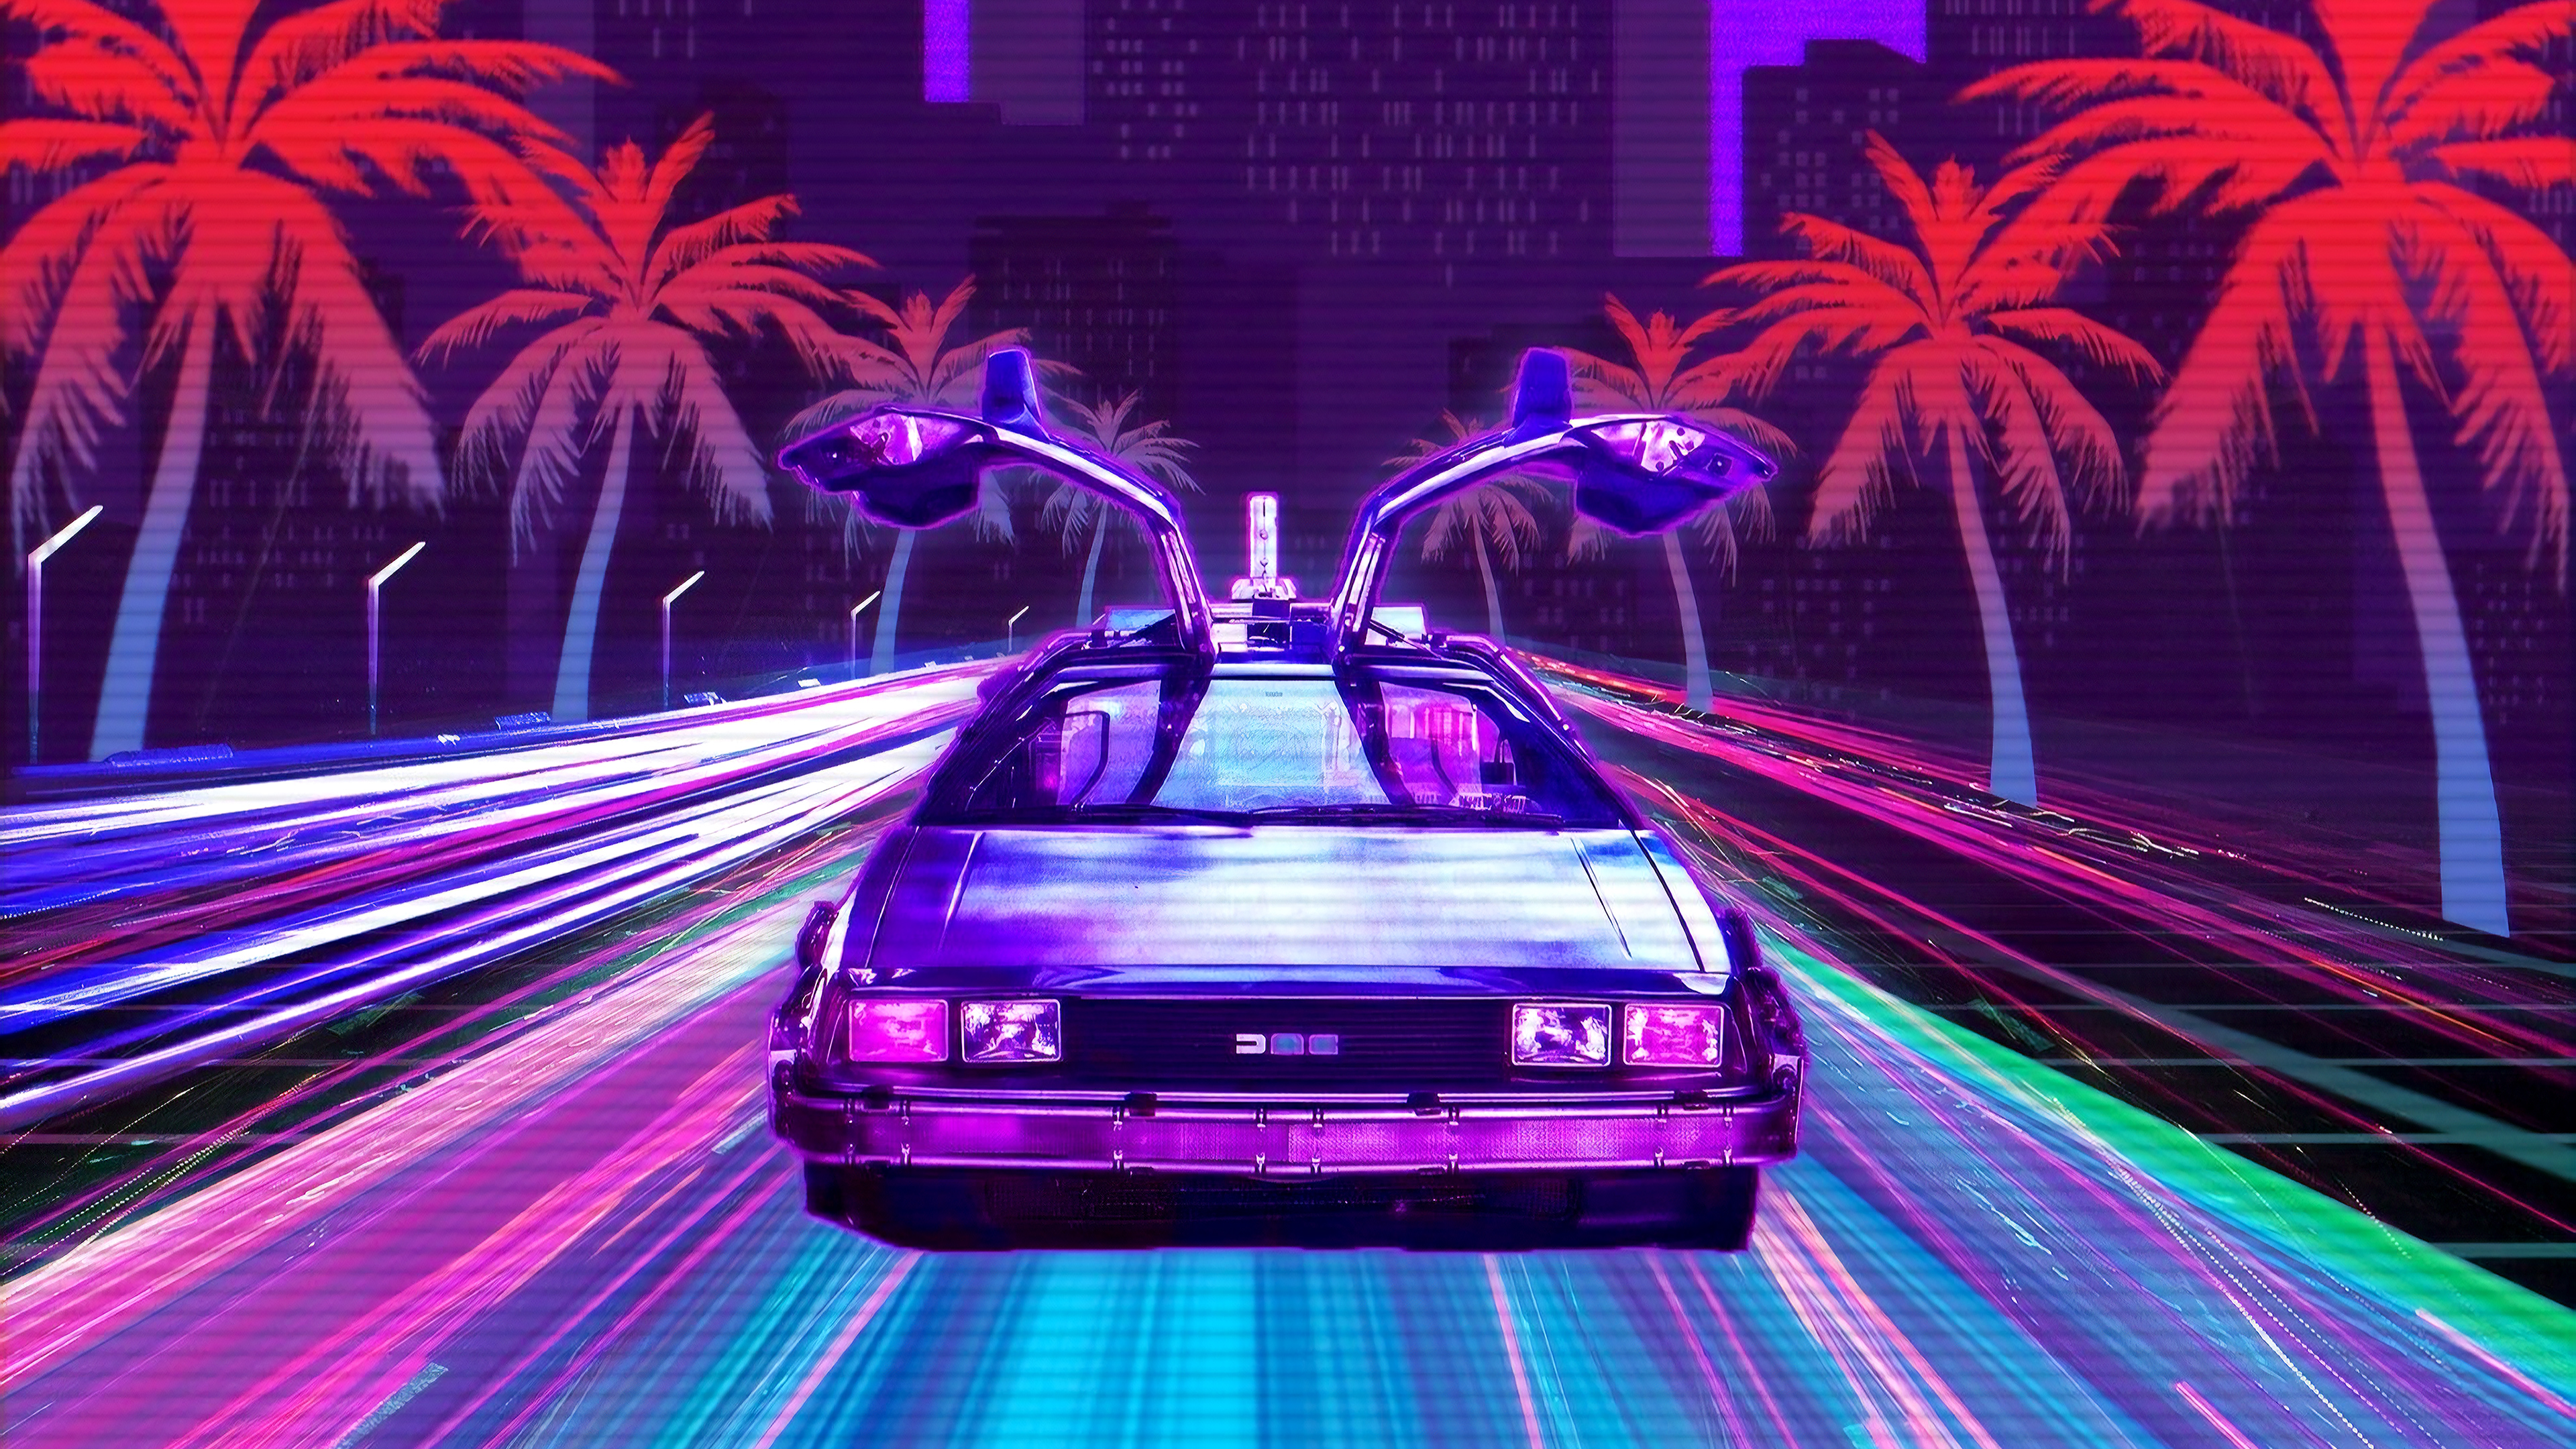 retro lux cars retrowave 4k 1547936812 - Retro Lux Cars Retrowave 4k - retrowave wallpapers, hd-wallpapers, digital art wallpapers, cars wallpapers, artwork wallpapers, artist wallpapers, 4k-wallpapers